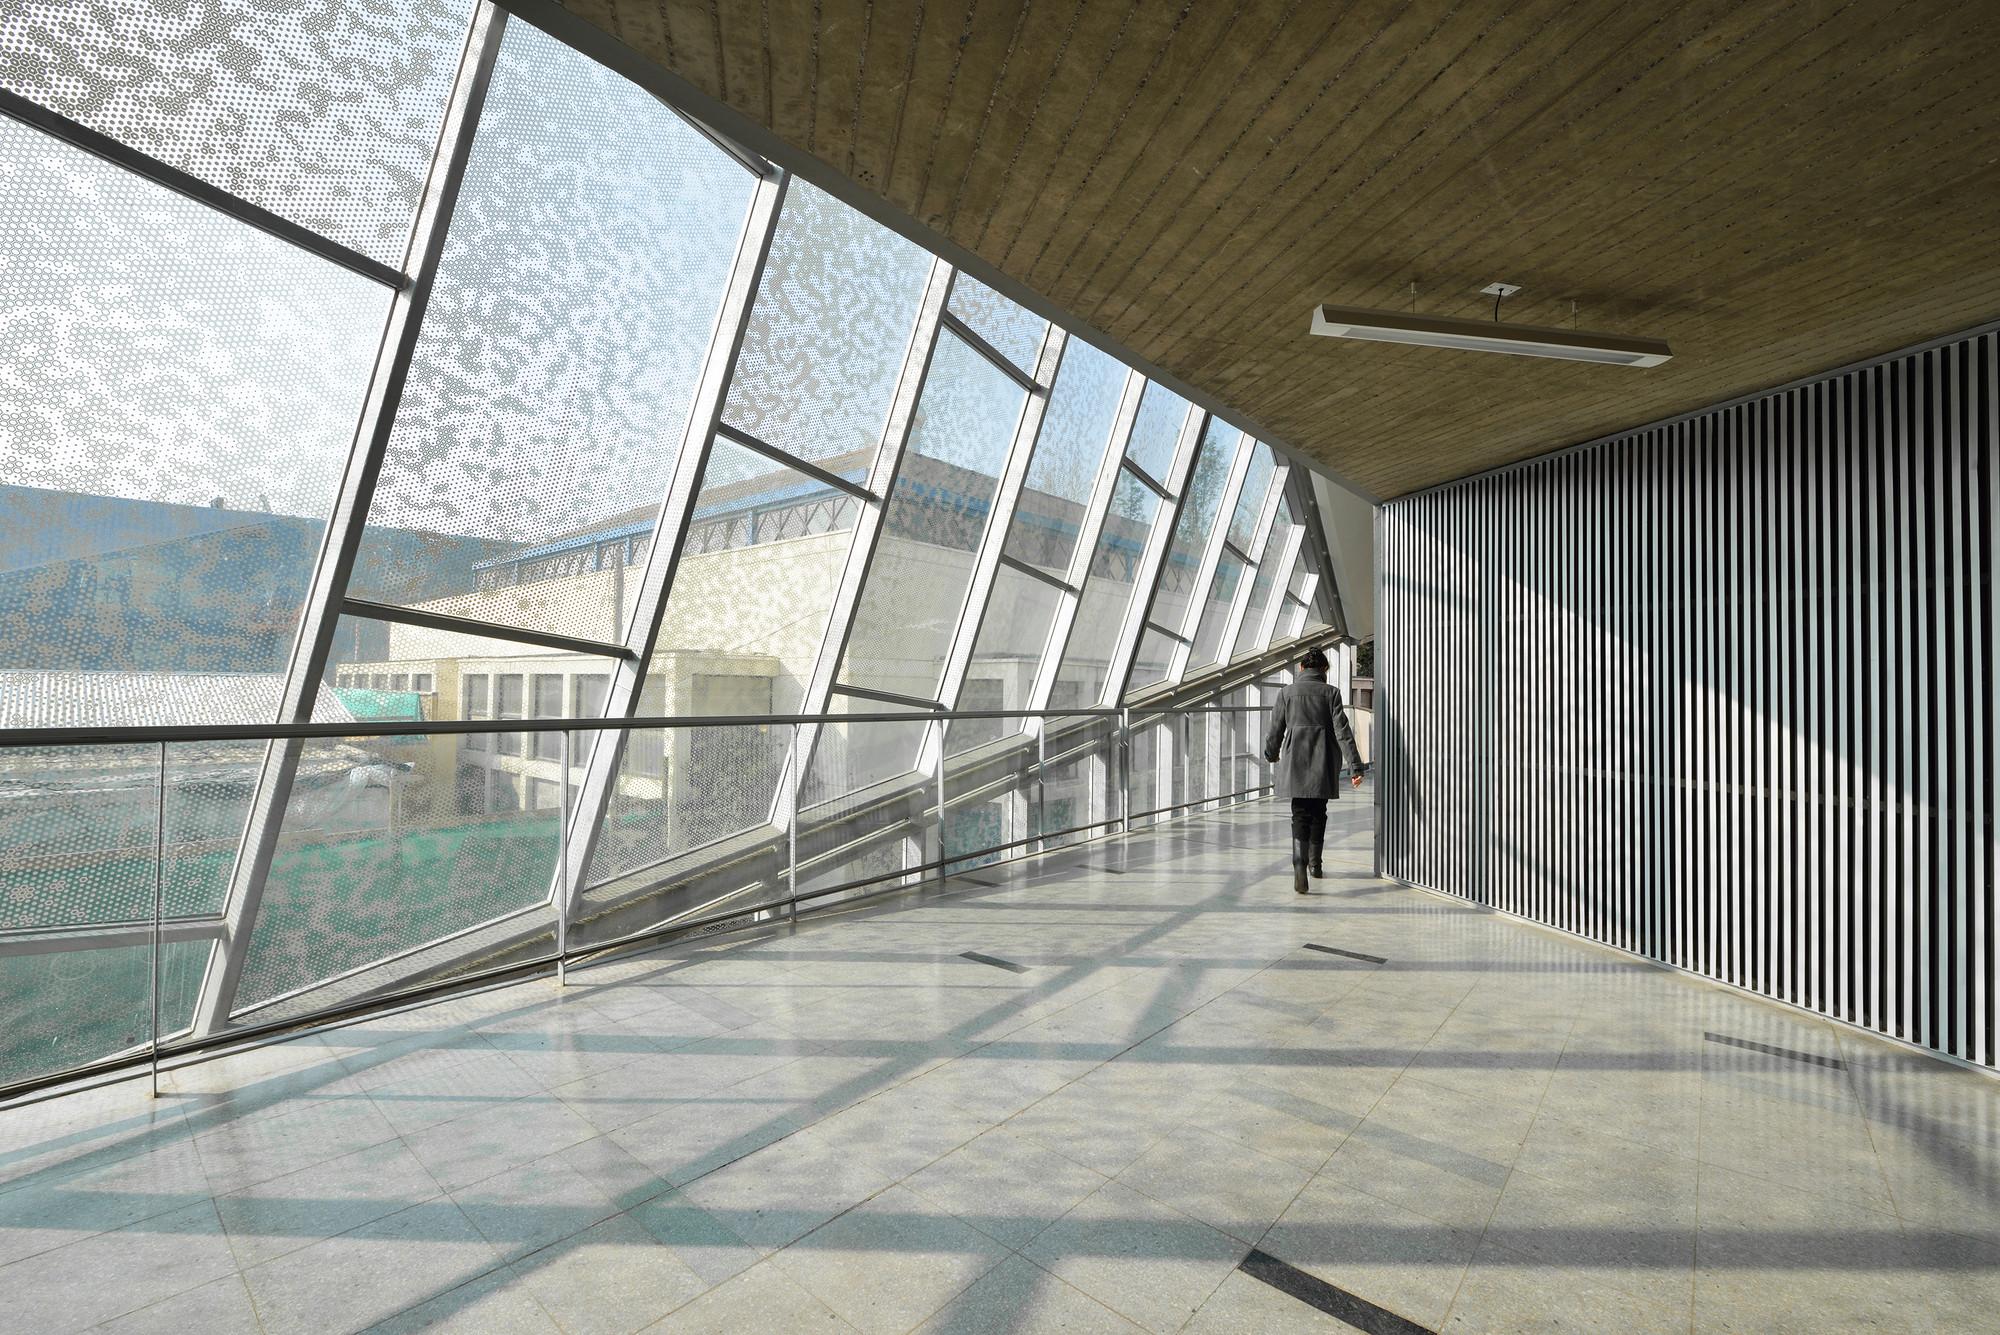 Universidad de chile juan gomez millas campus classroom for Universidades para arquitectura